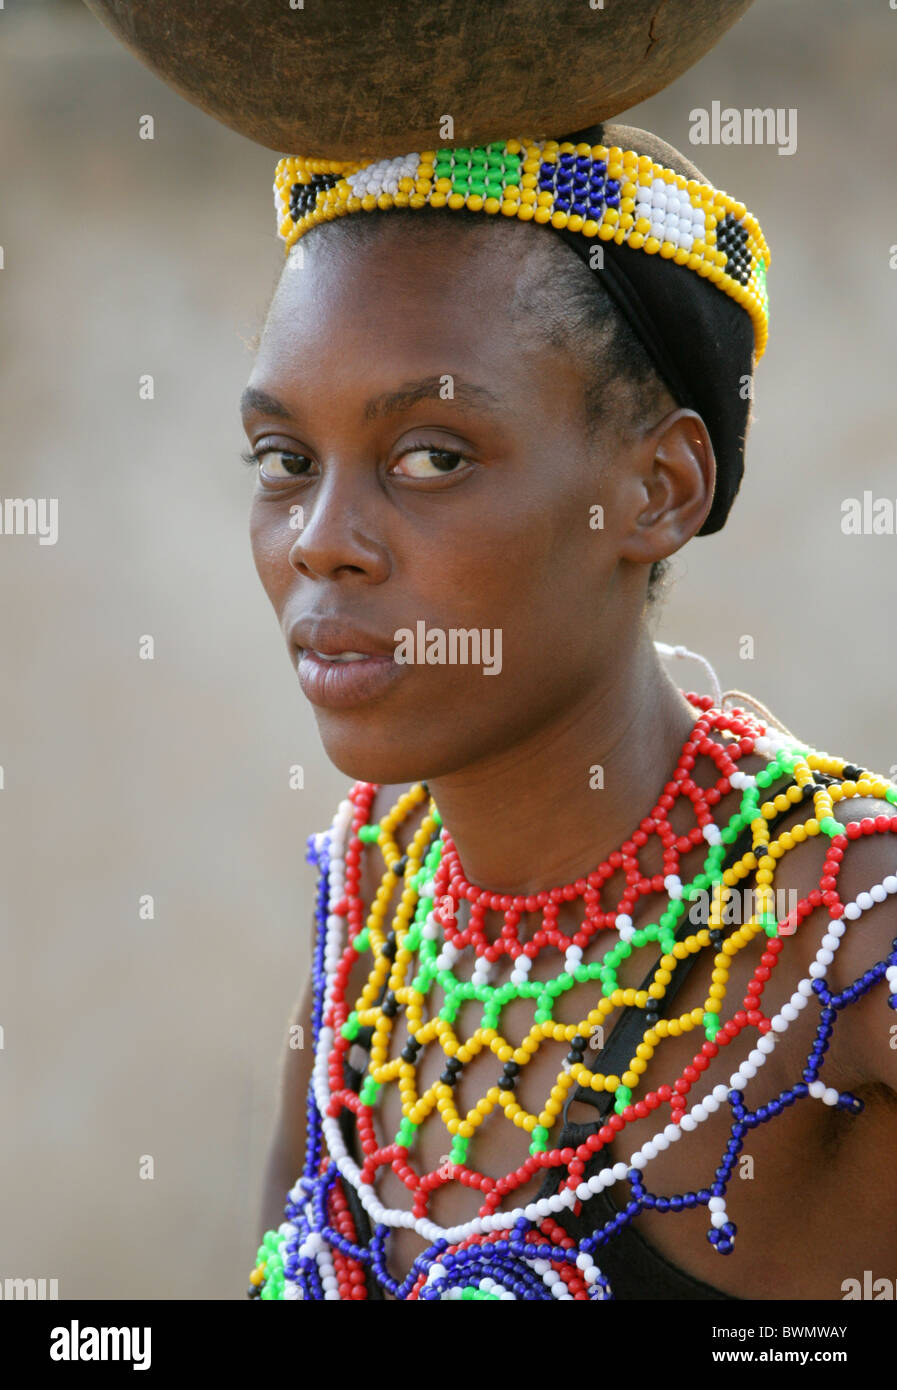 Zulu traditional dress in zulu kraal kwazulu natal -  Kwazulu Natal Africa Zulu Girls Wearing Traditional Beaded Dress And Carrying Pots On Their Heads Shakaland Zulu Village